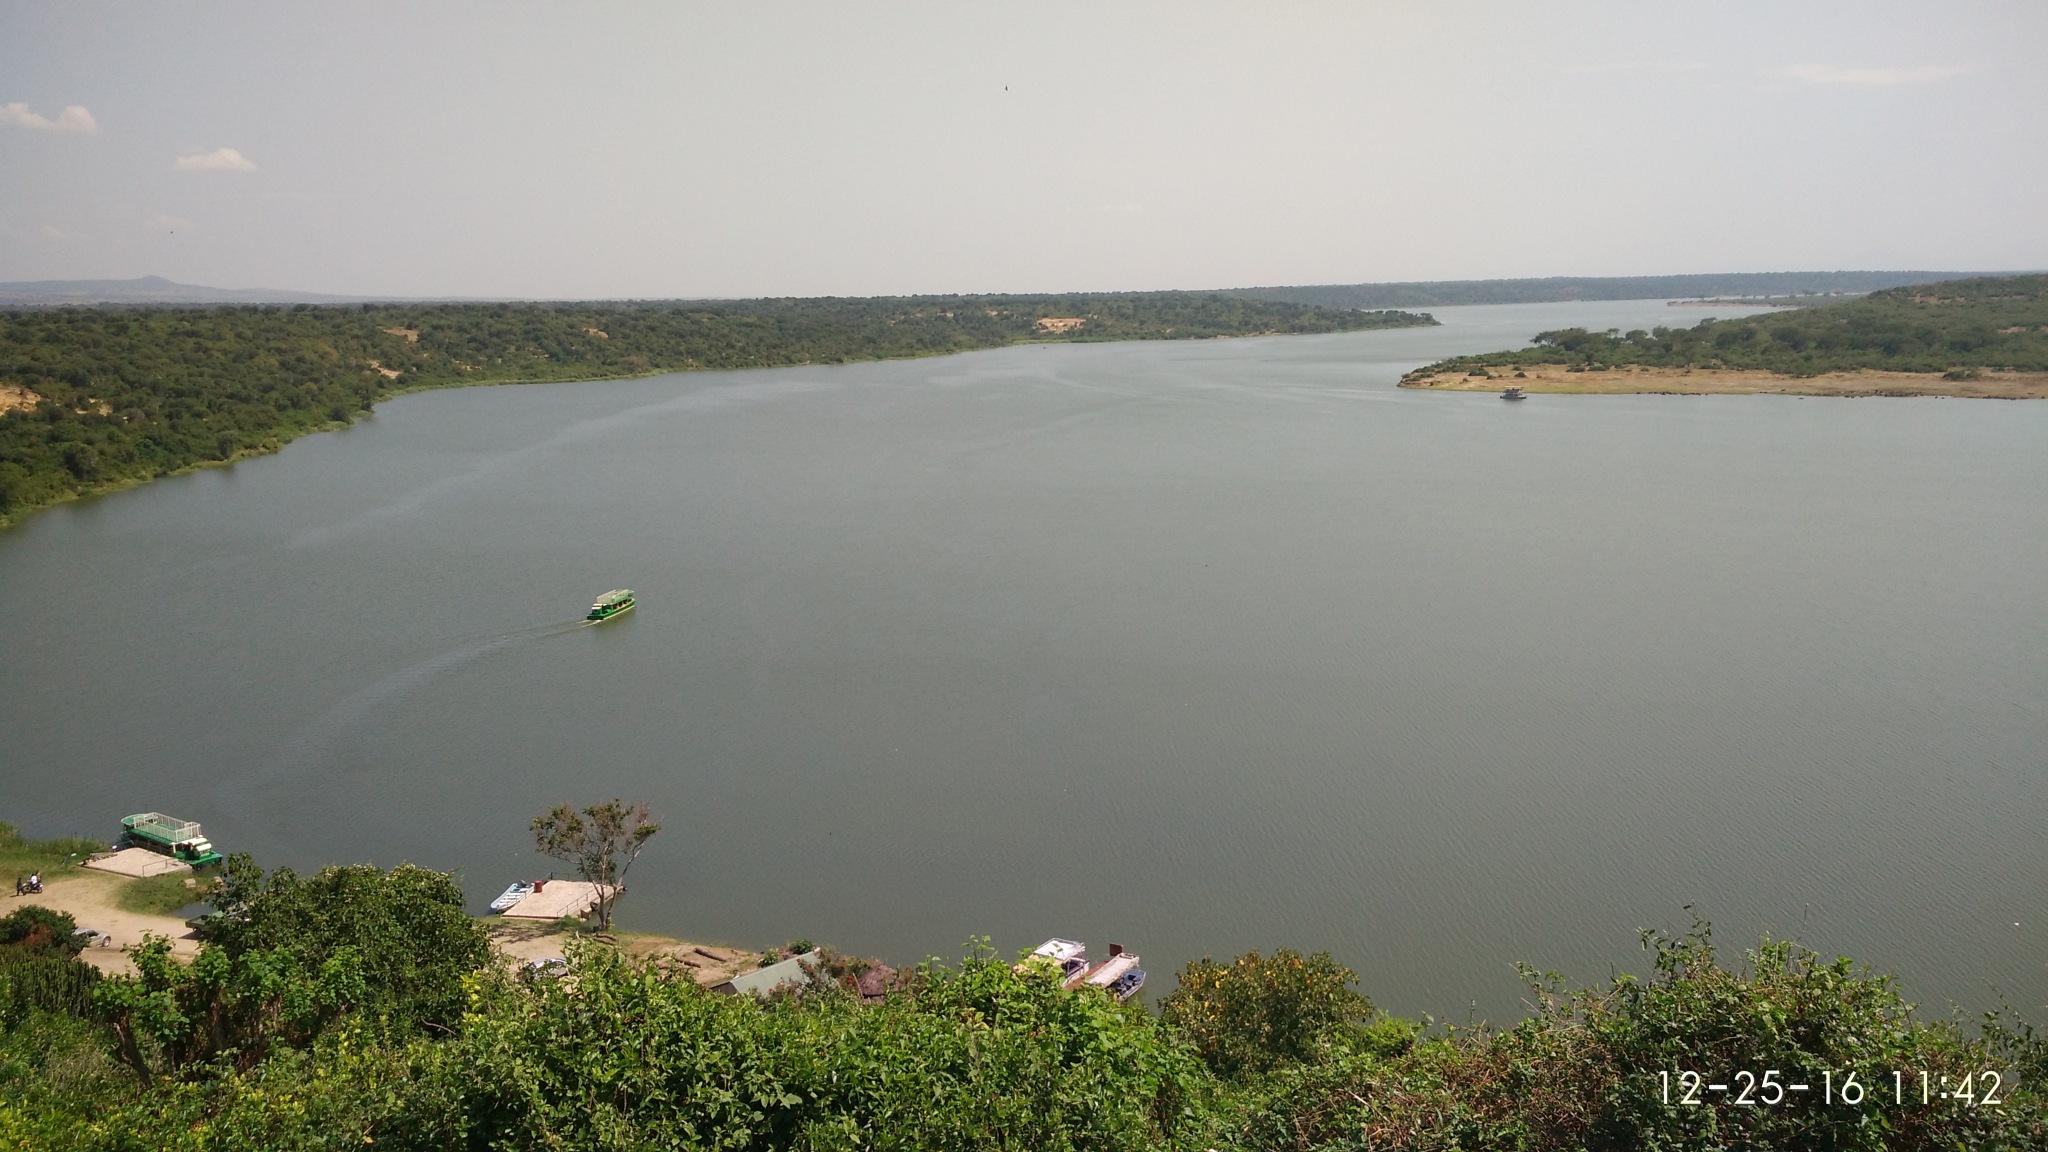 Katwe bay of Lake Edward by Bharat R Khatri